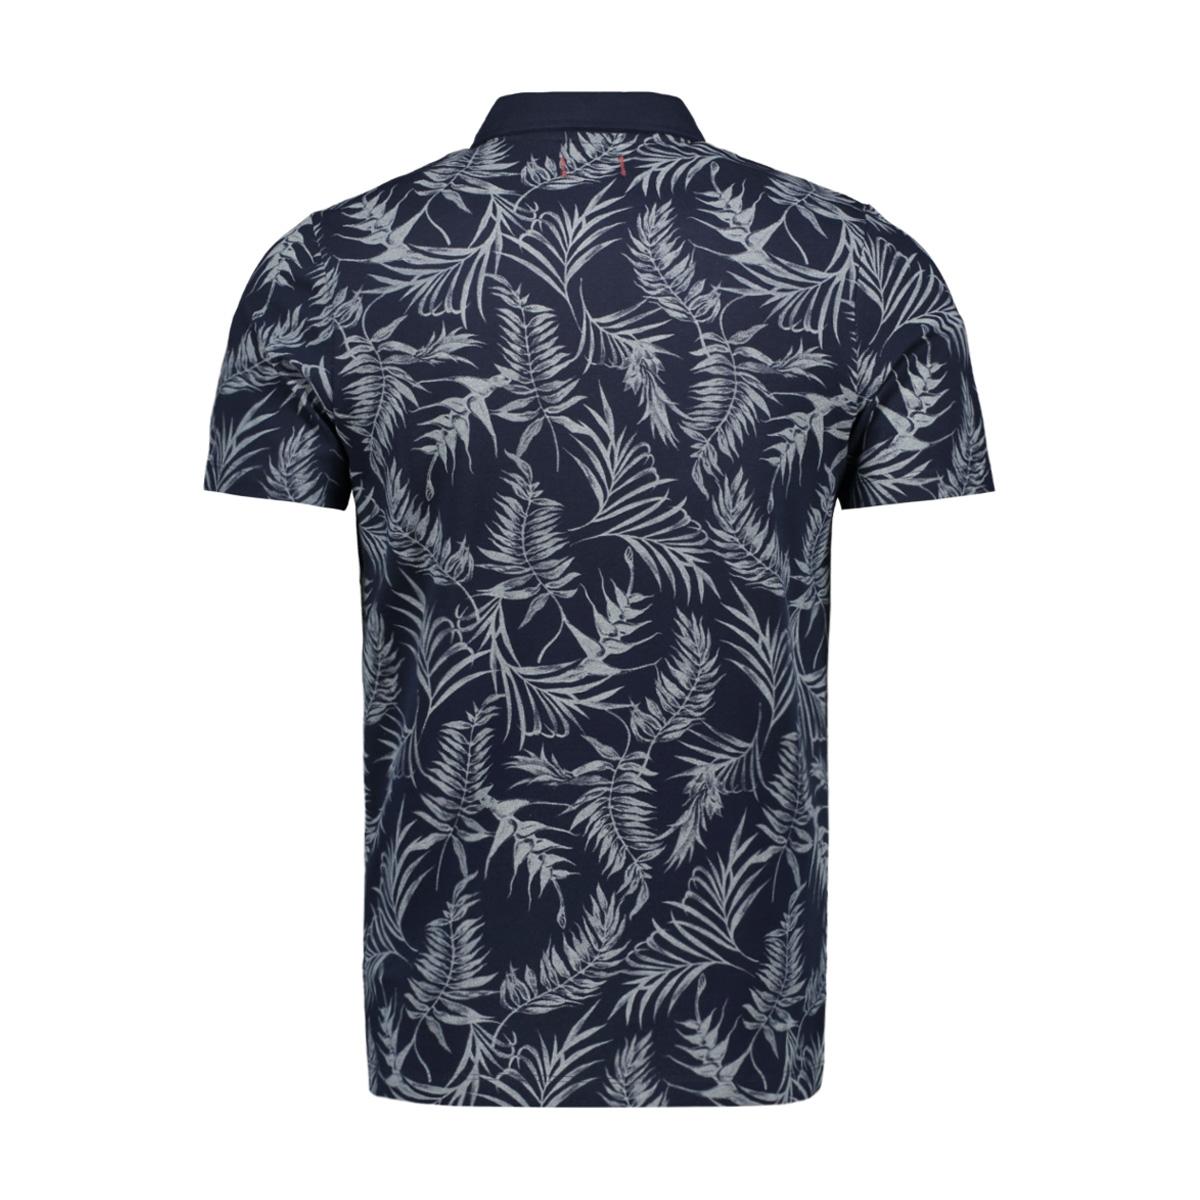 jprgrayson blu. polo ss 12149300 jack & jones polo navy blazer/flower print